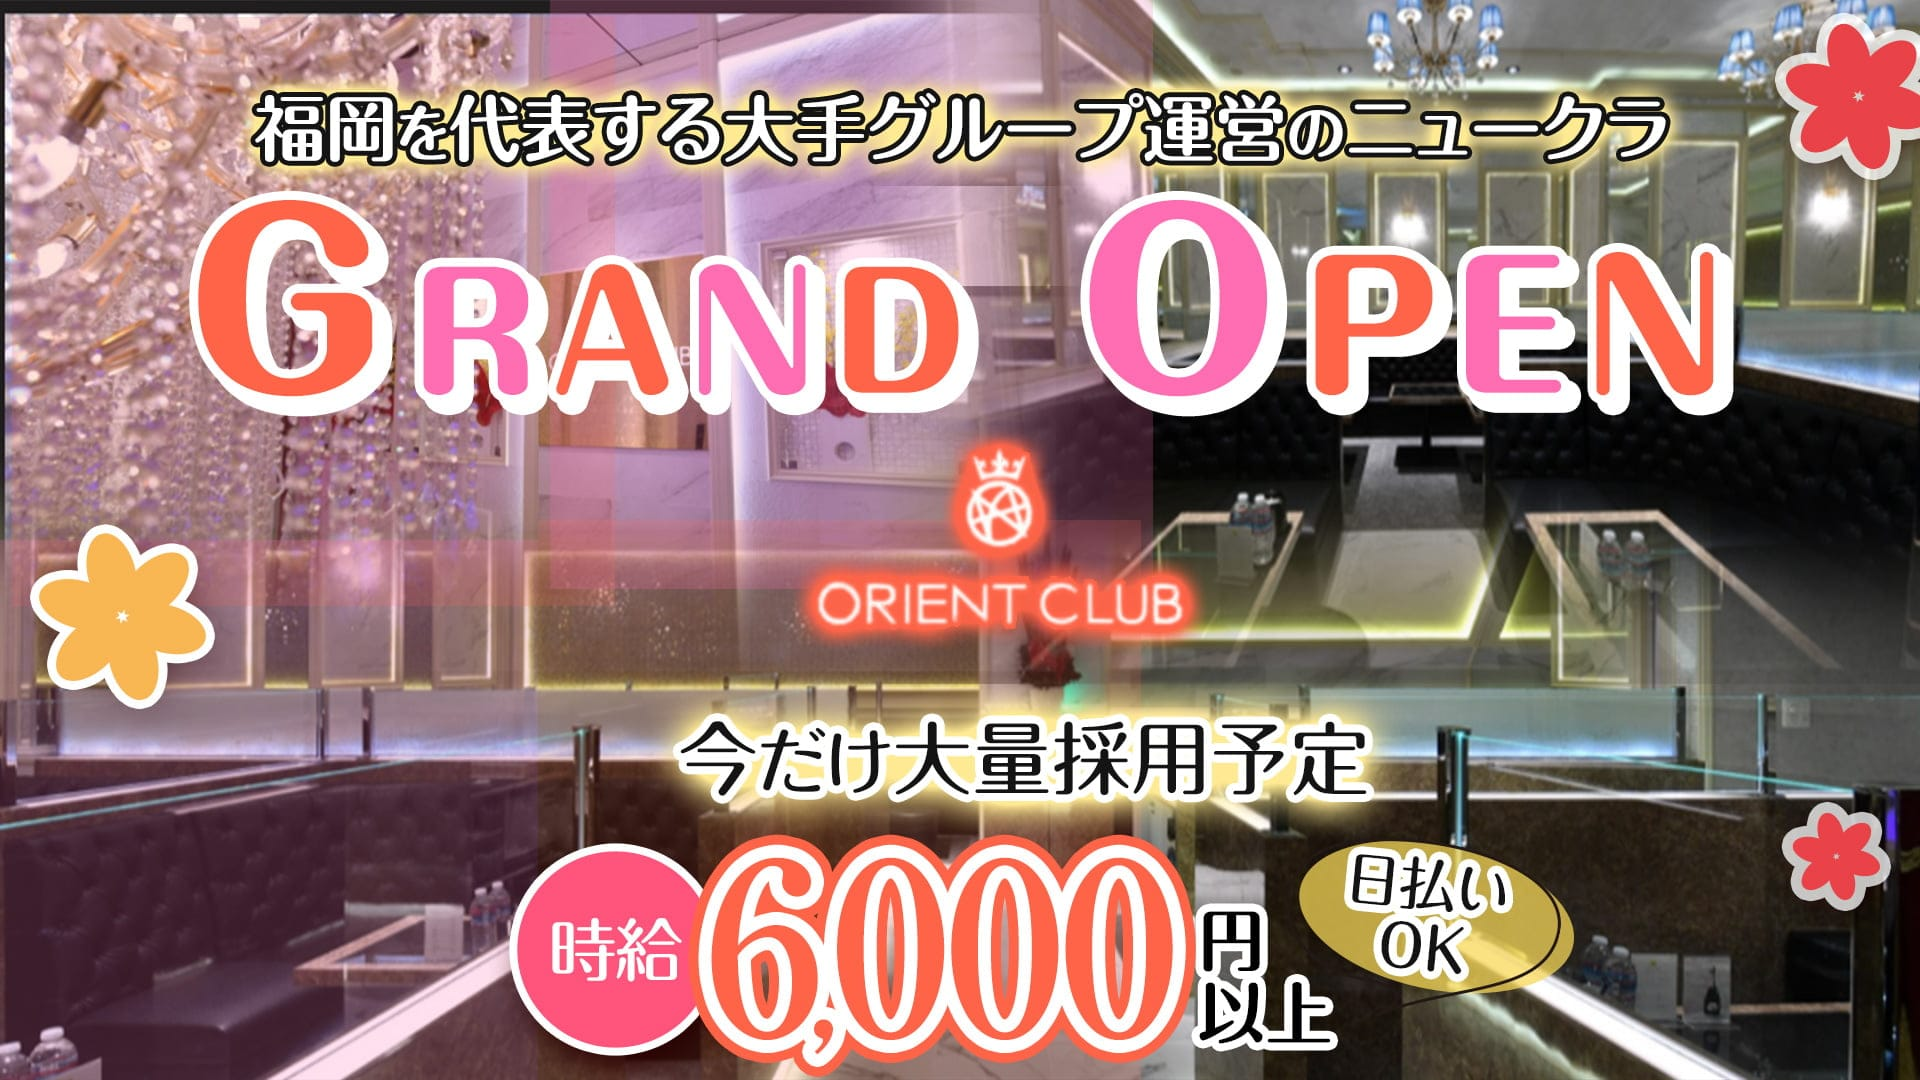 Orient Club(オリエントクラブ)【公式求人・体入情報】 中洲ニュークラブ TOP画像